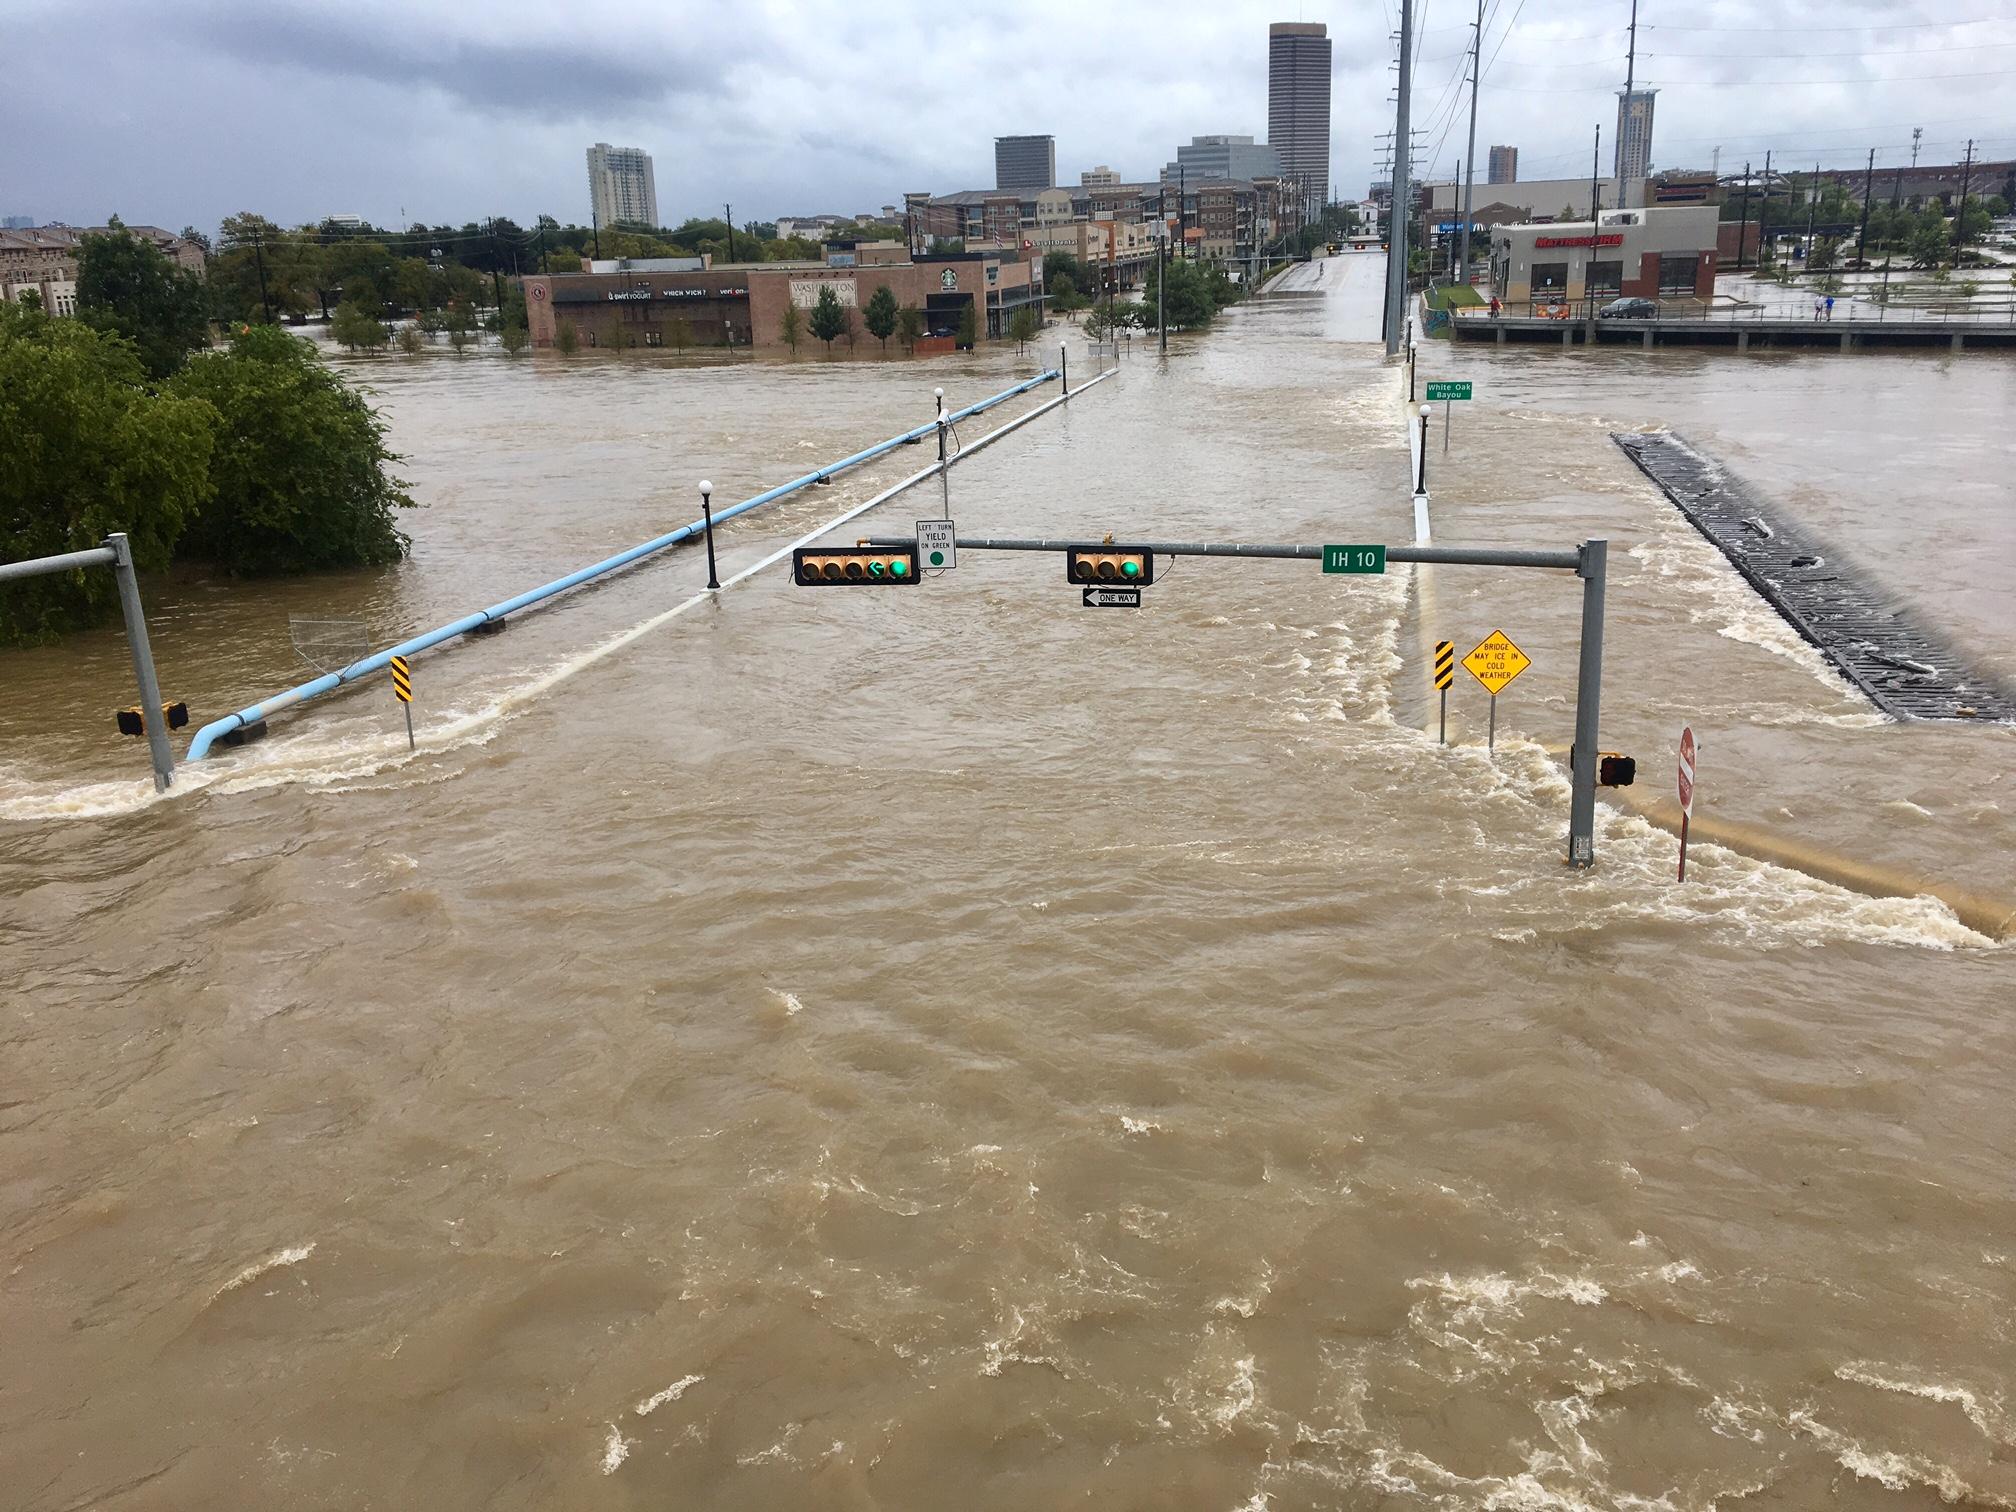 houston flooding - photo #9